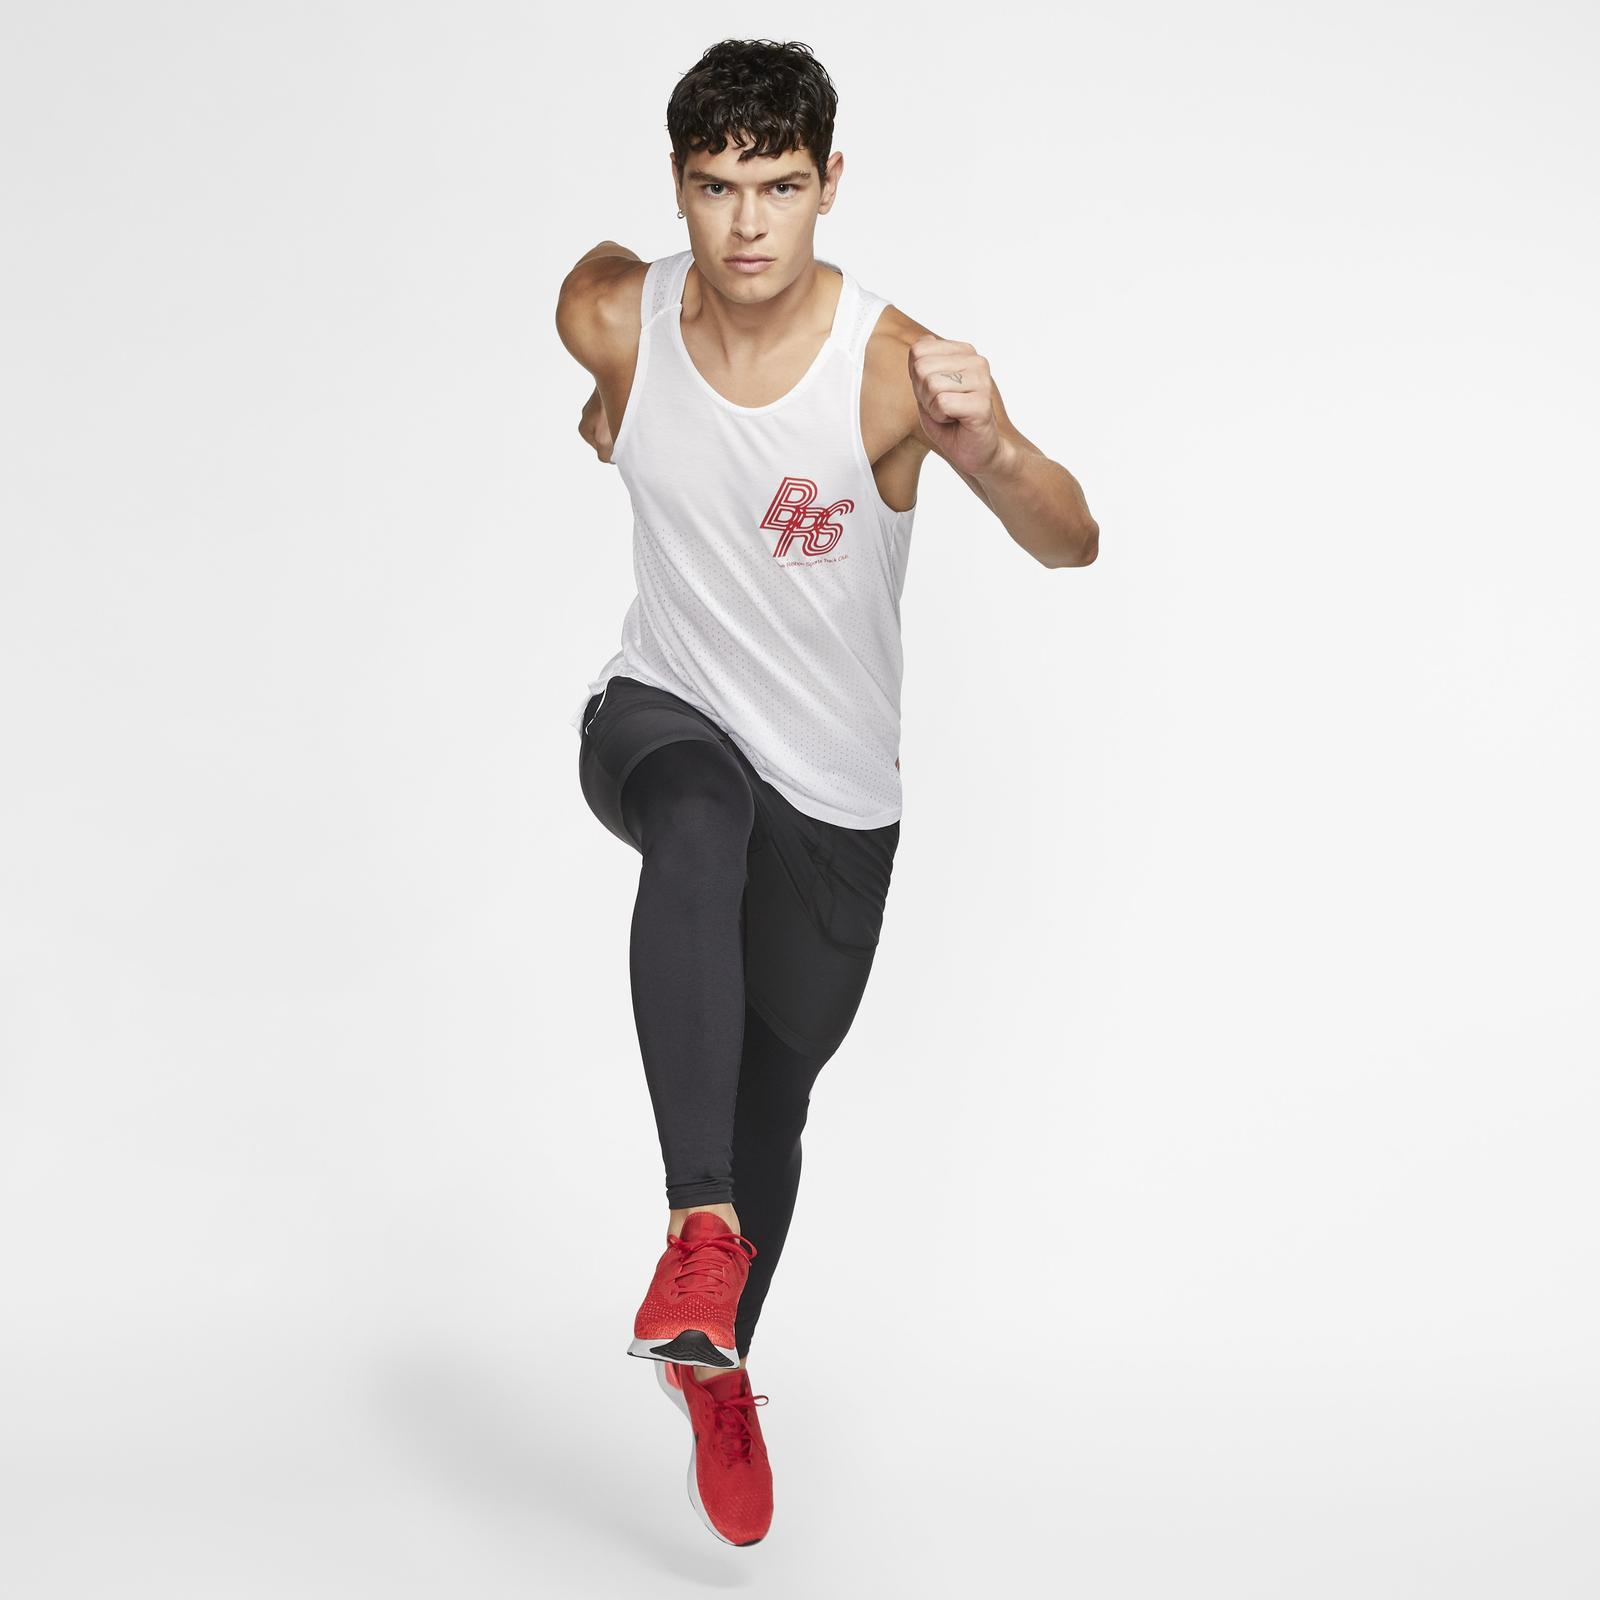 5043ebf2c7a6a Nike BRS (Blue Ribbon Sports) Pack 1